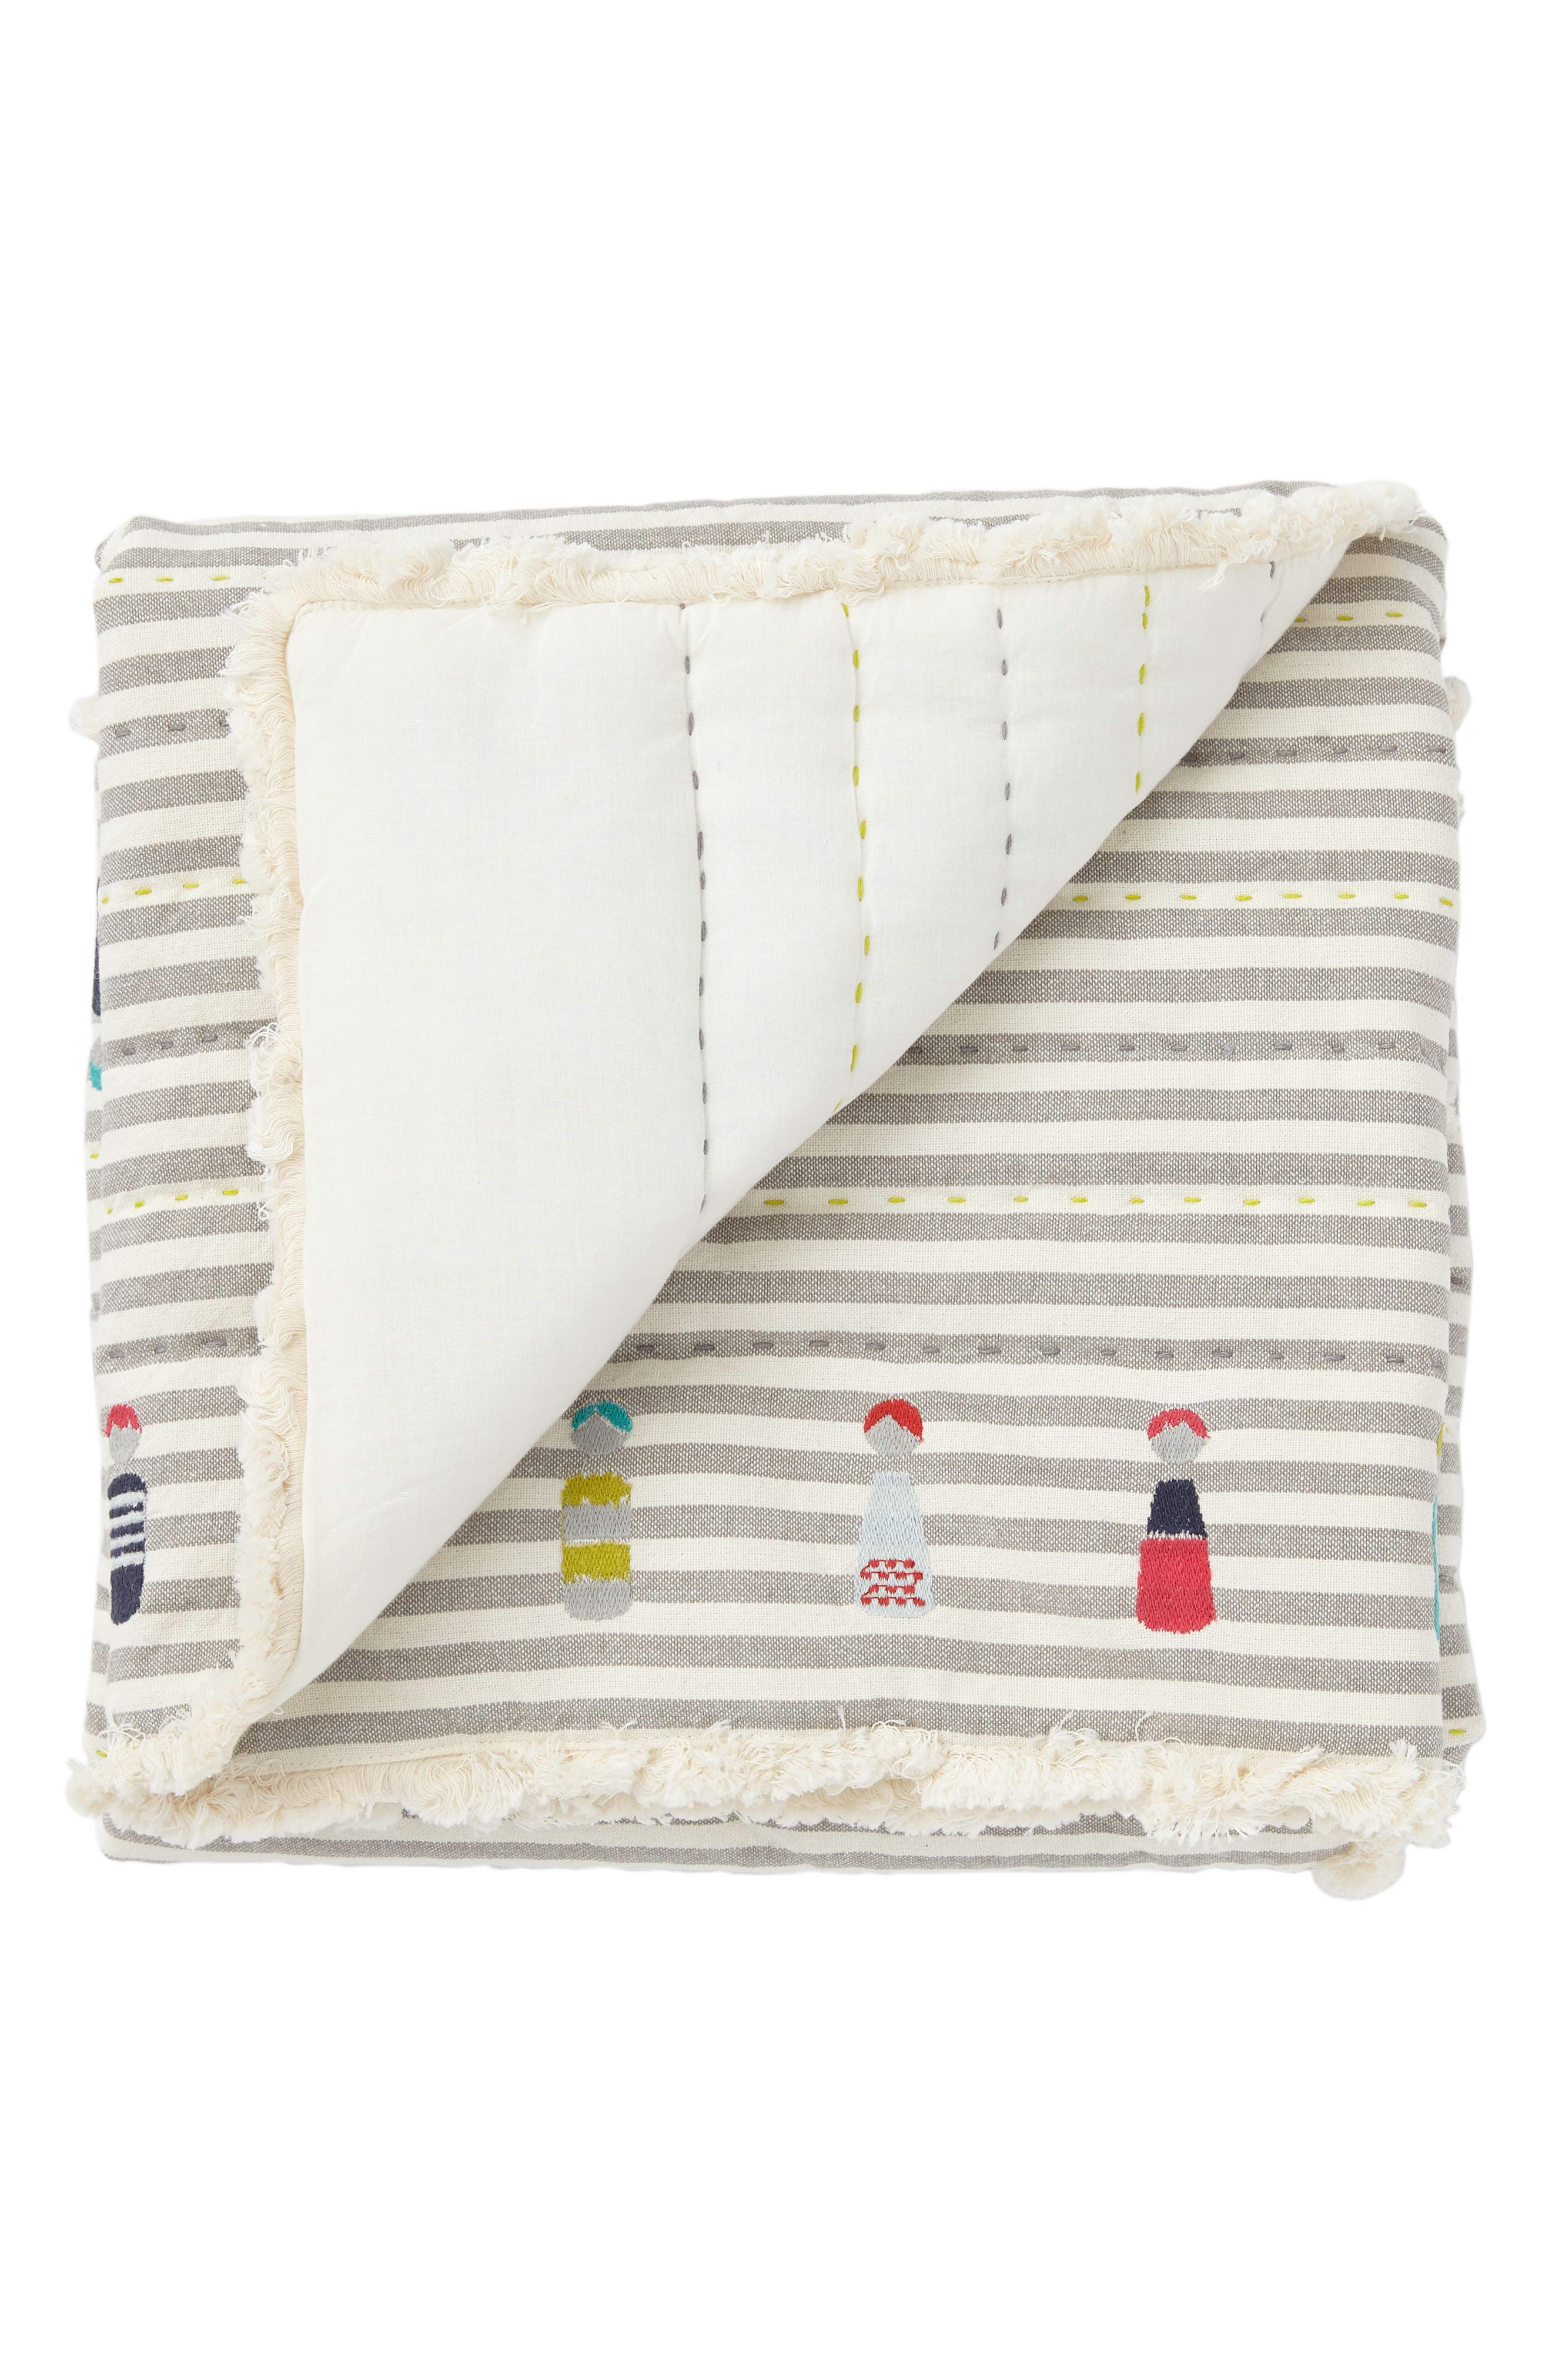 Little Peeps Play Blanket,                             Main thumbnail 1, color,                             GREY